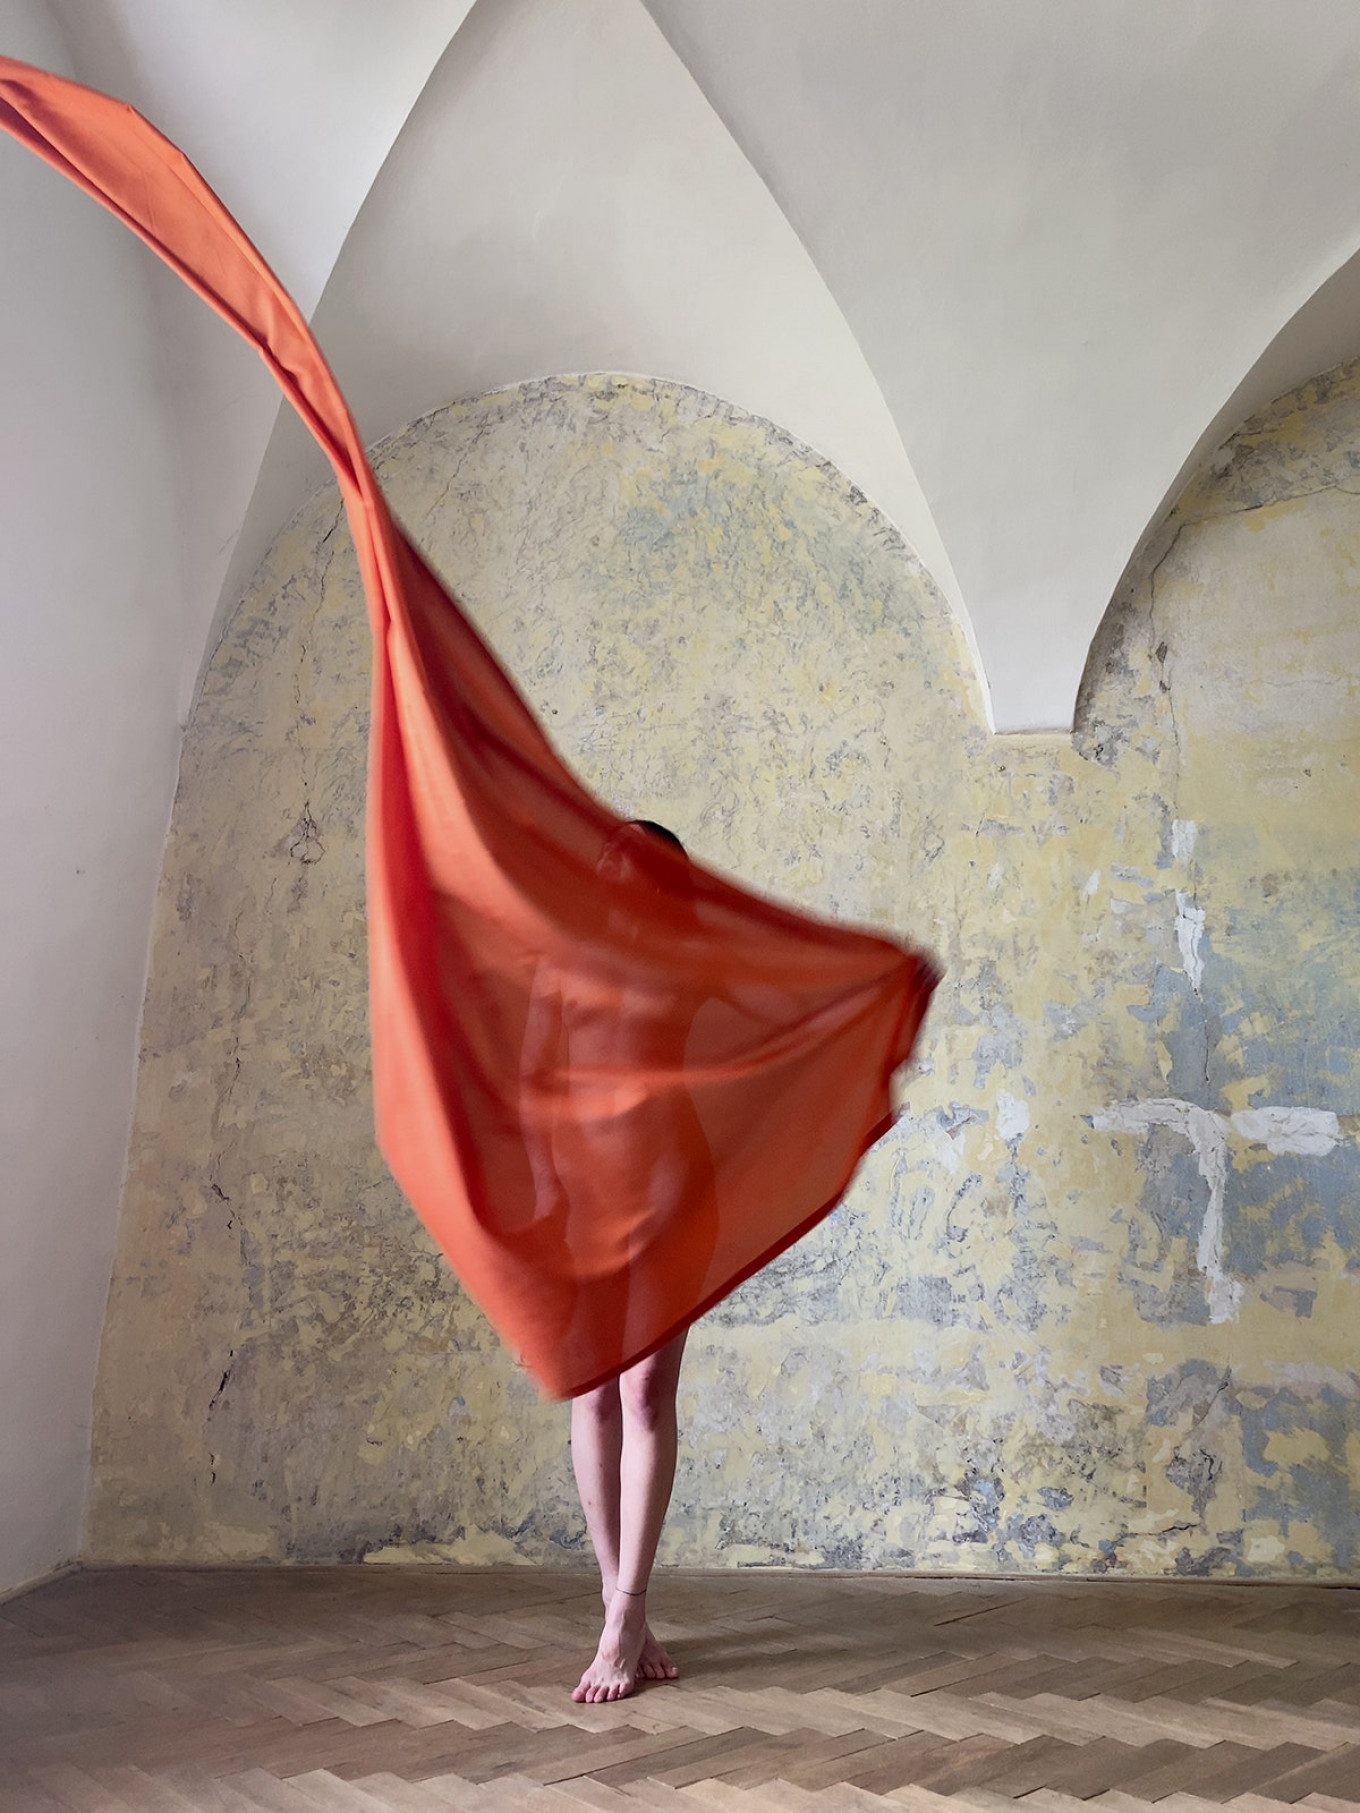 Image in support of Yulia Tsvetkova, Italian Vogue Emmie America